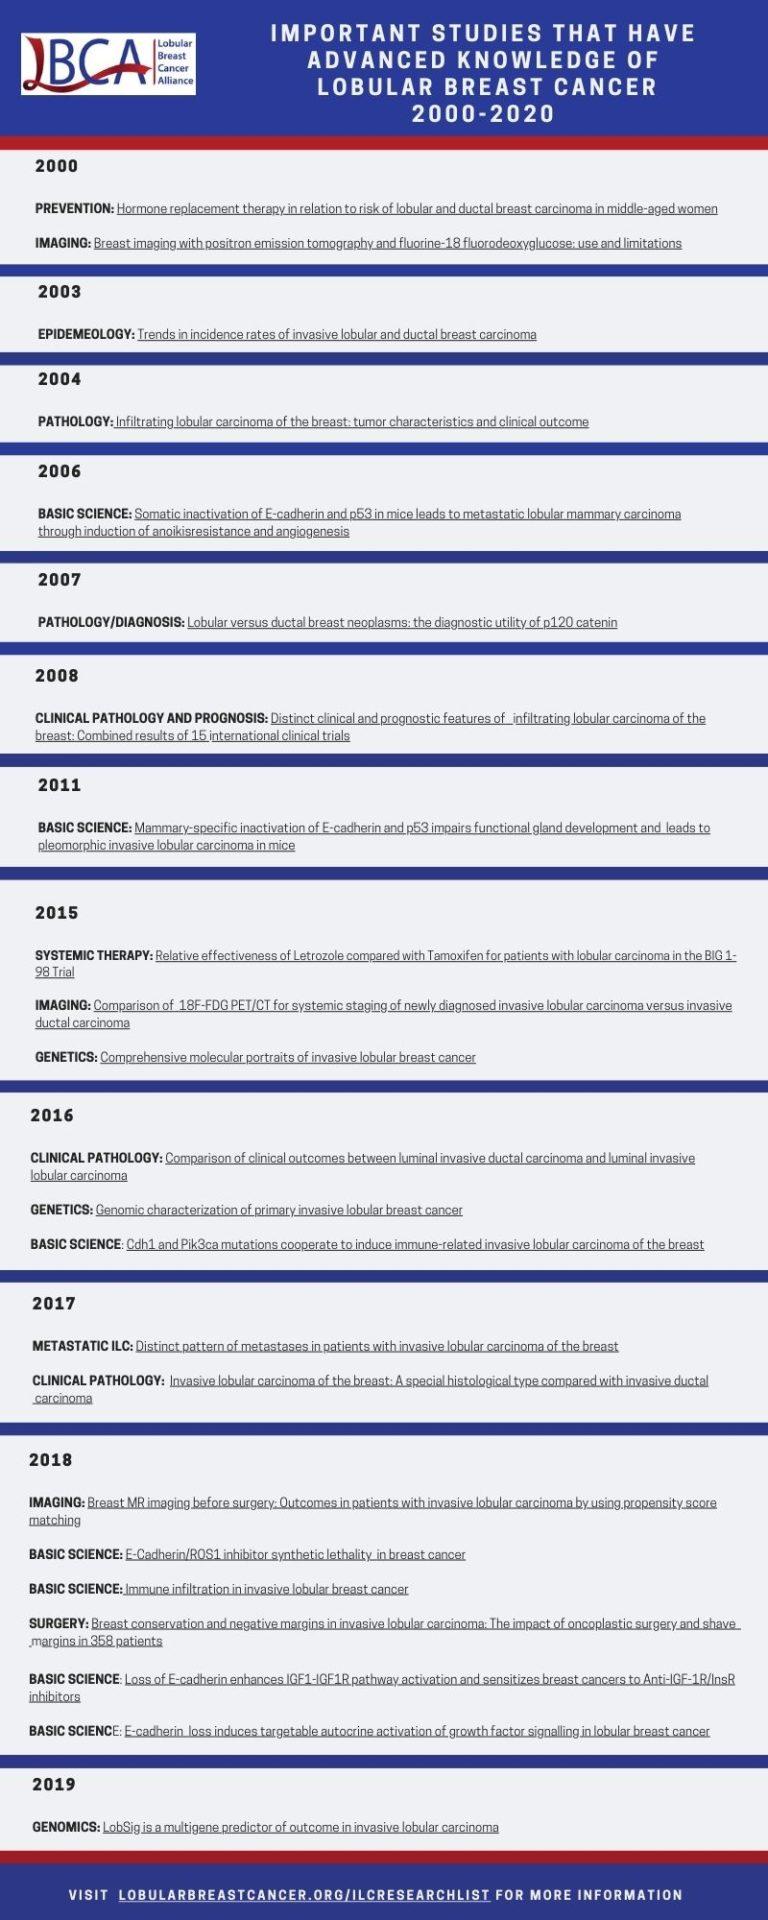 LBCA Important Studies 2000-2020